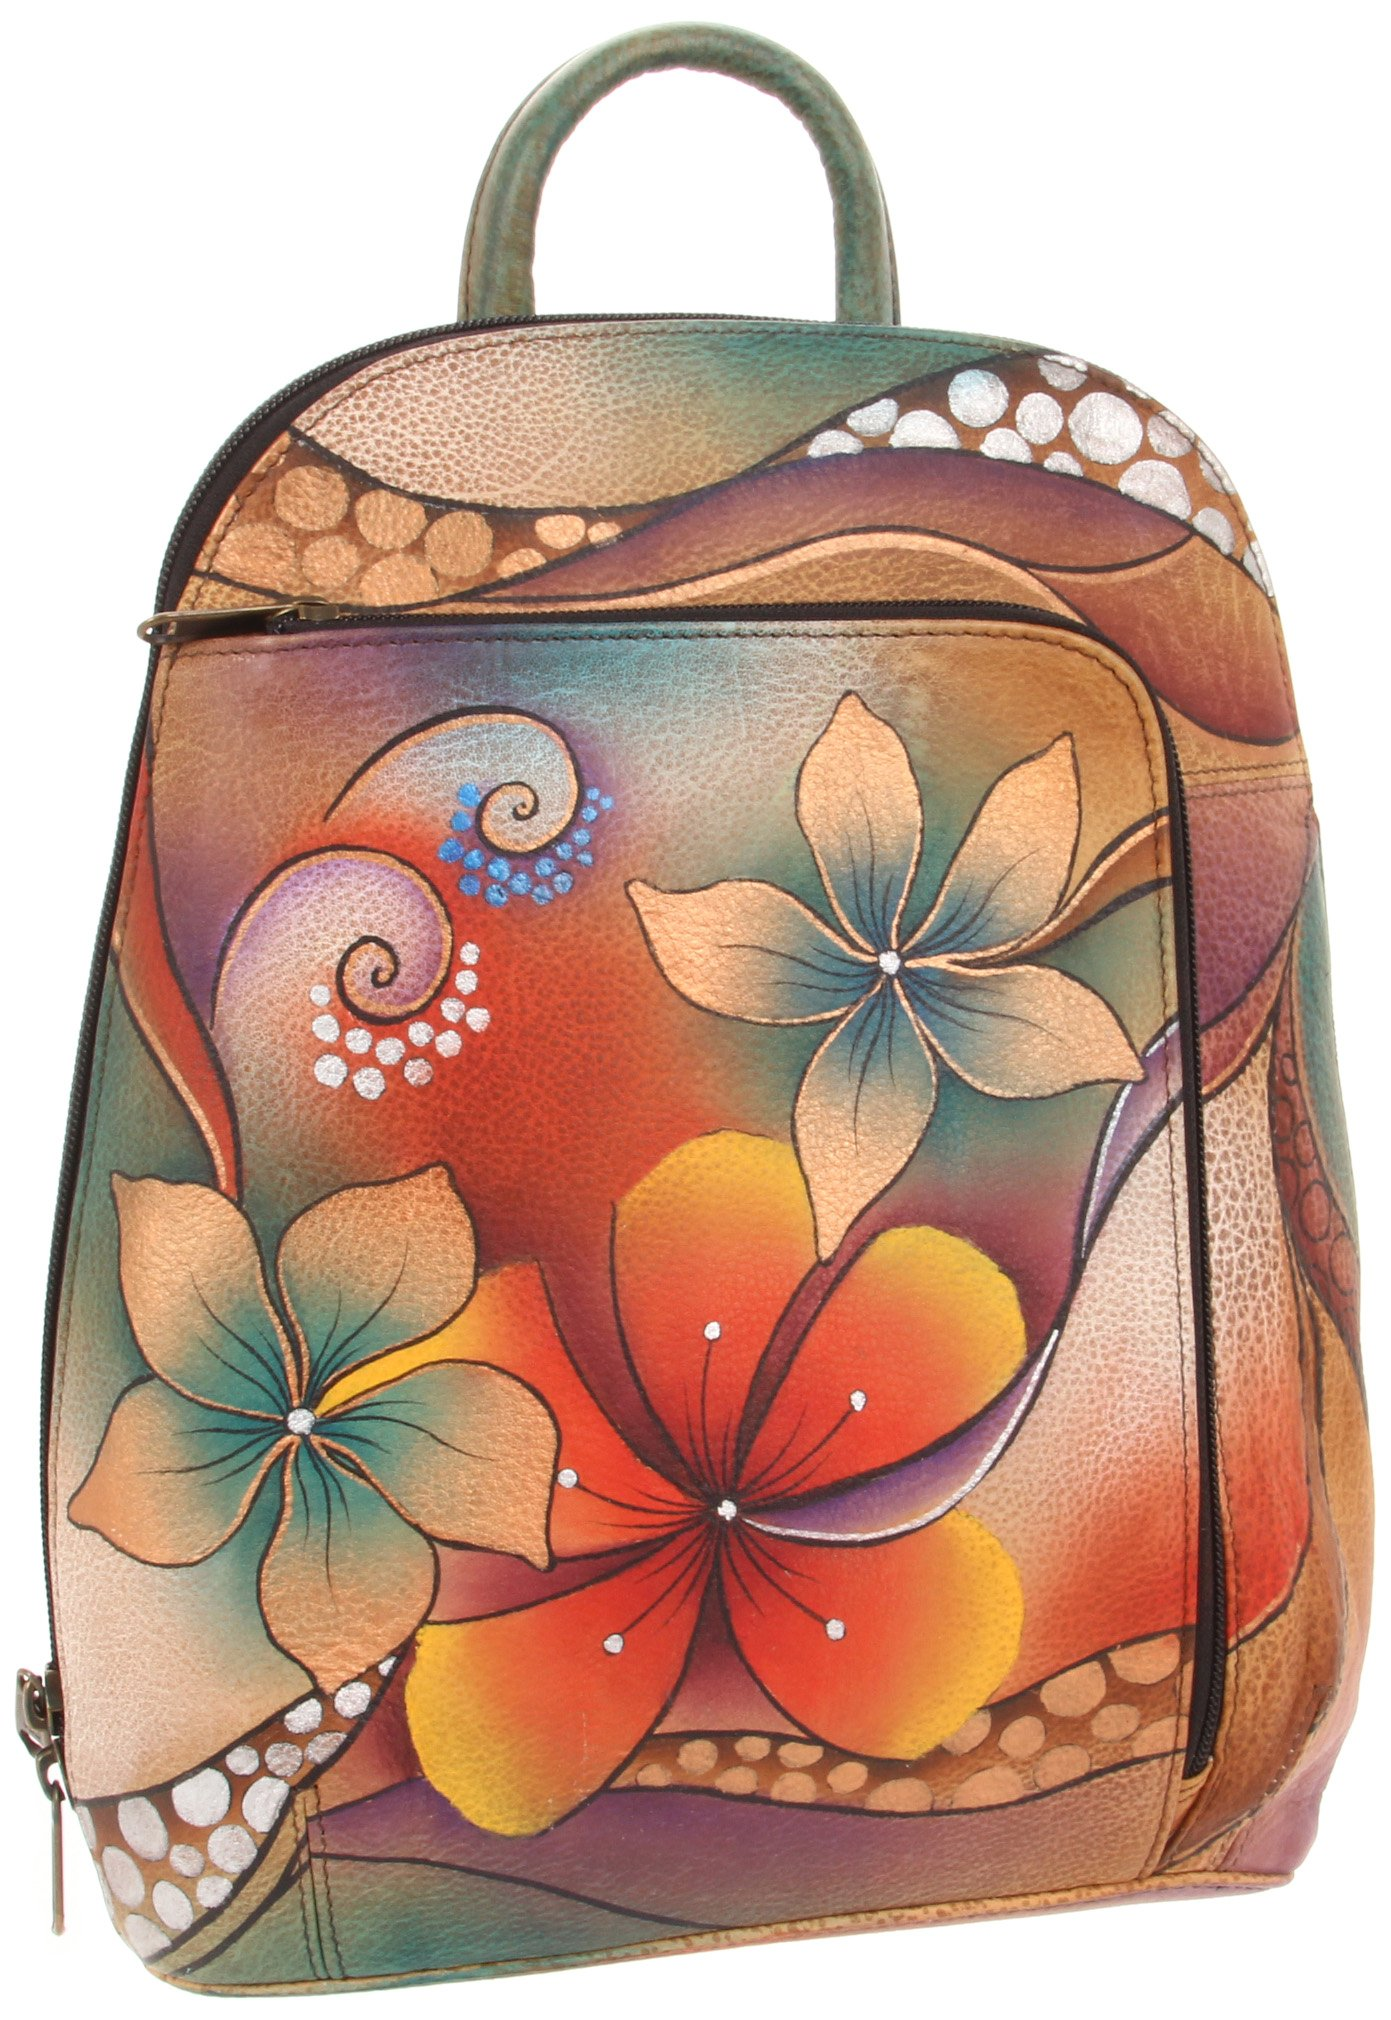 Anuschka 487 TRB Backpack,Tribal Bllom,One Size